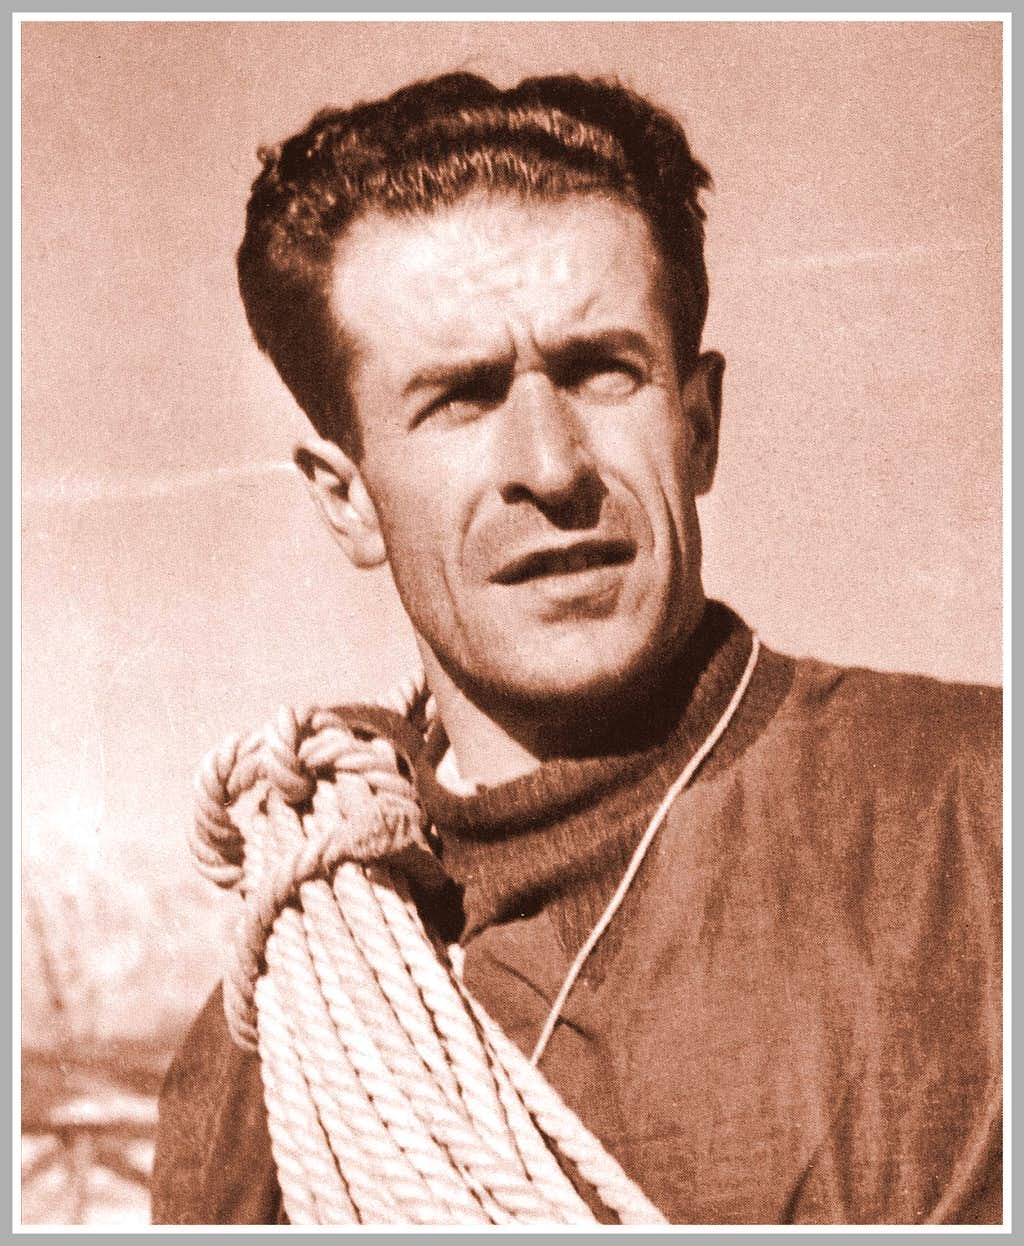 Raffaele Carlesso